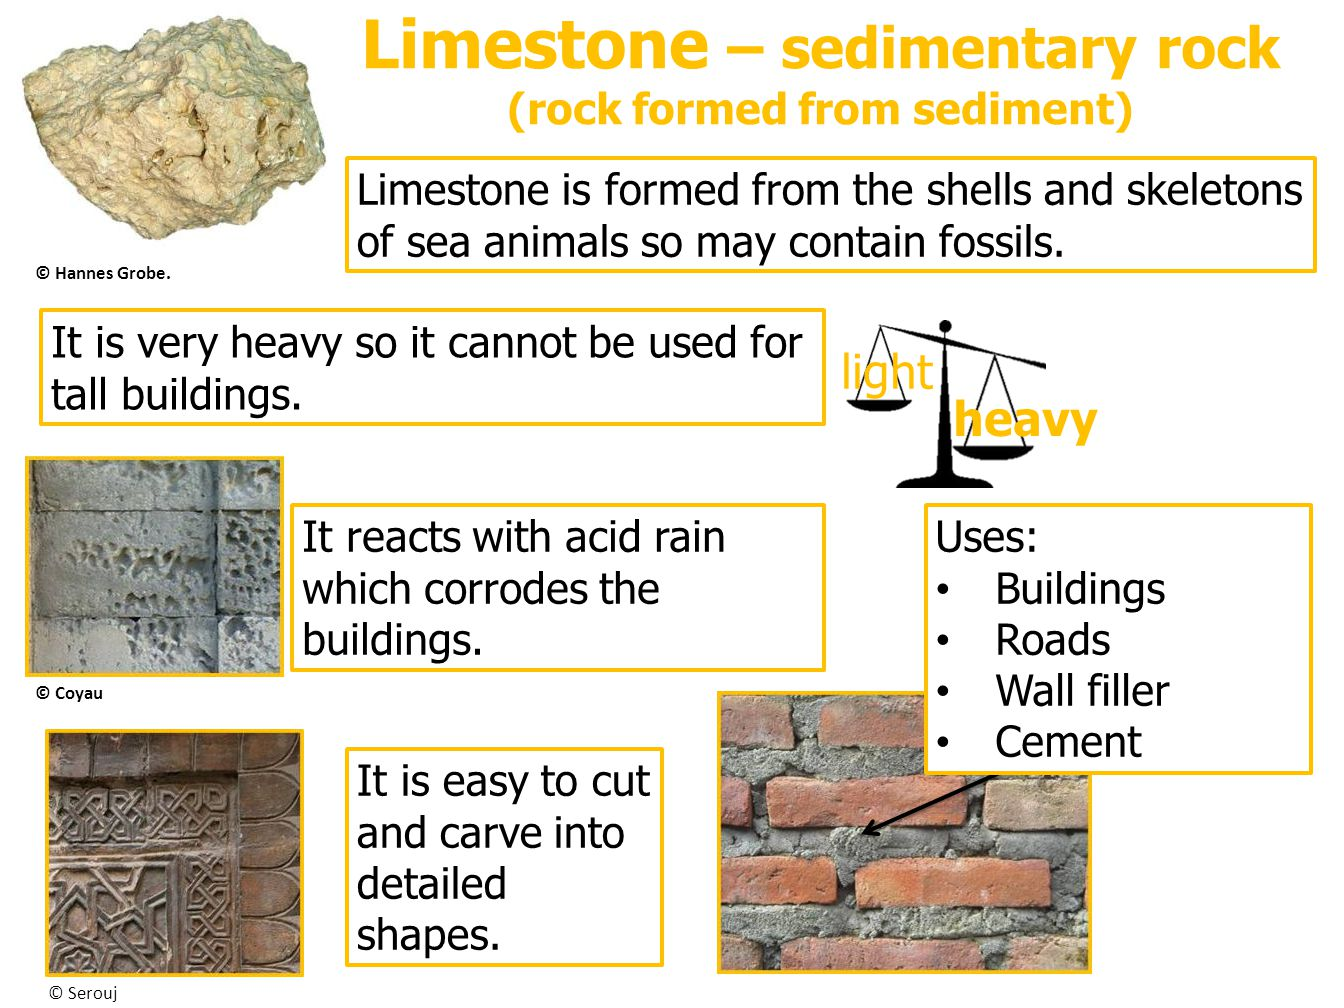 Limestone – sedimentary rock (rock formed from sediment)